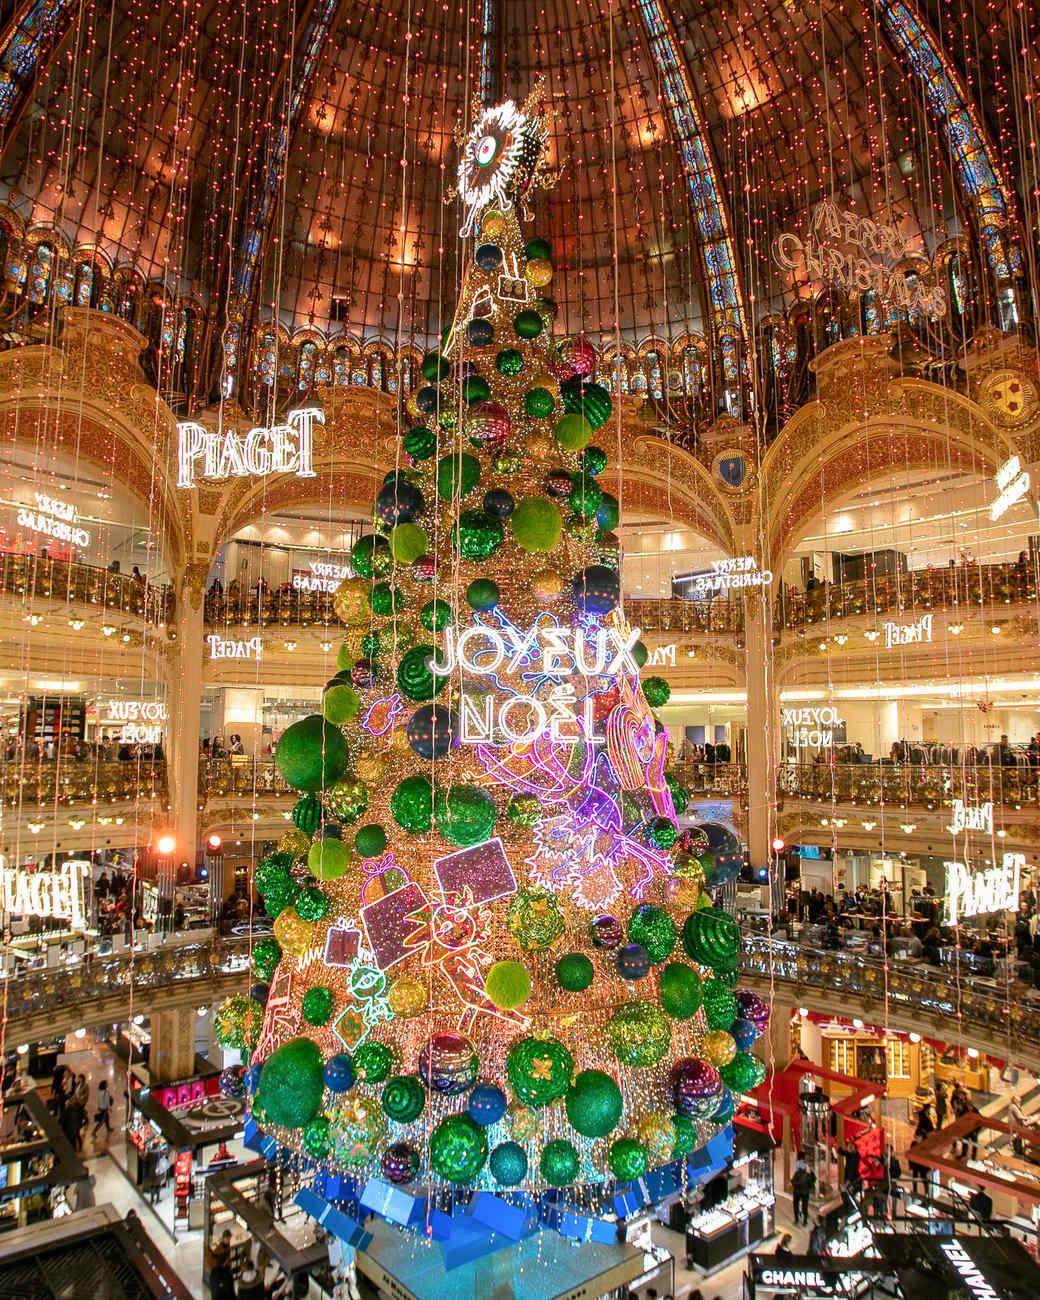 Les Galeries Lafayette Christmas Tree 2018